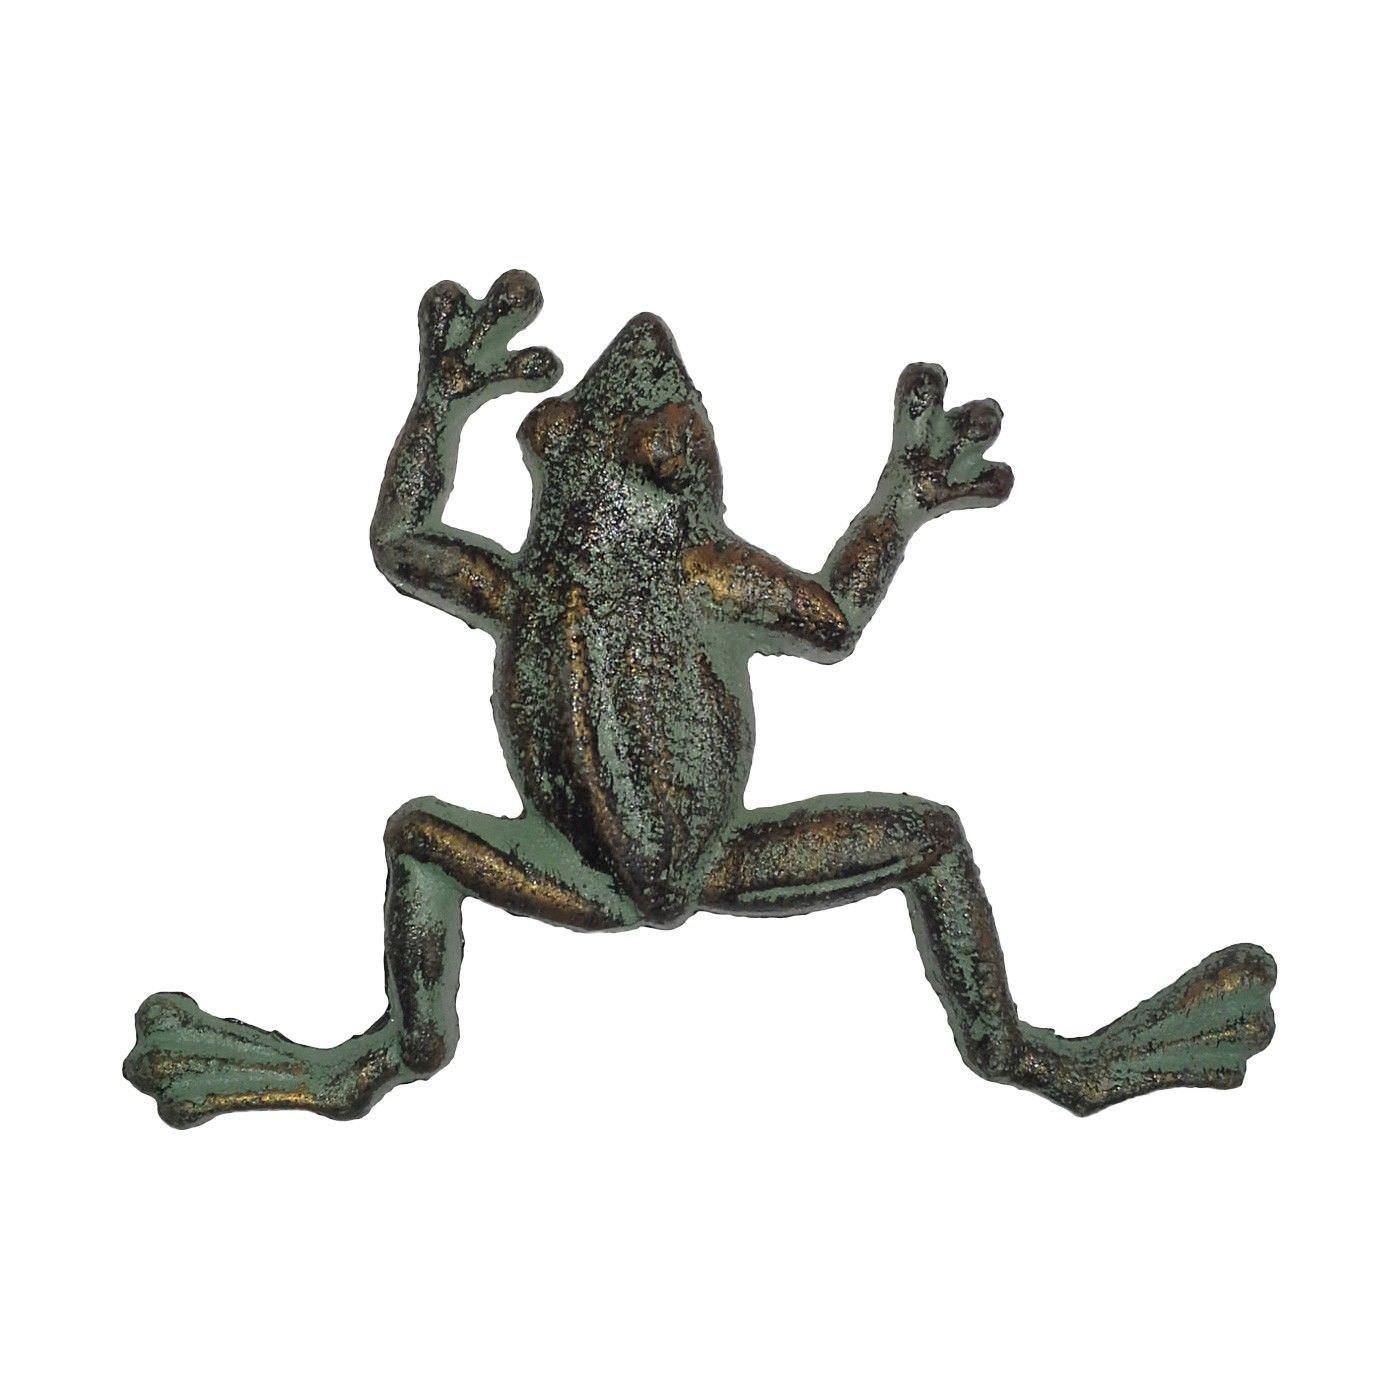 Cast Iron Frog Figurine Garden Decor, Small, Verdigris